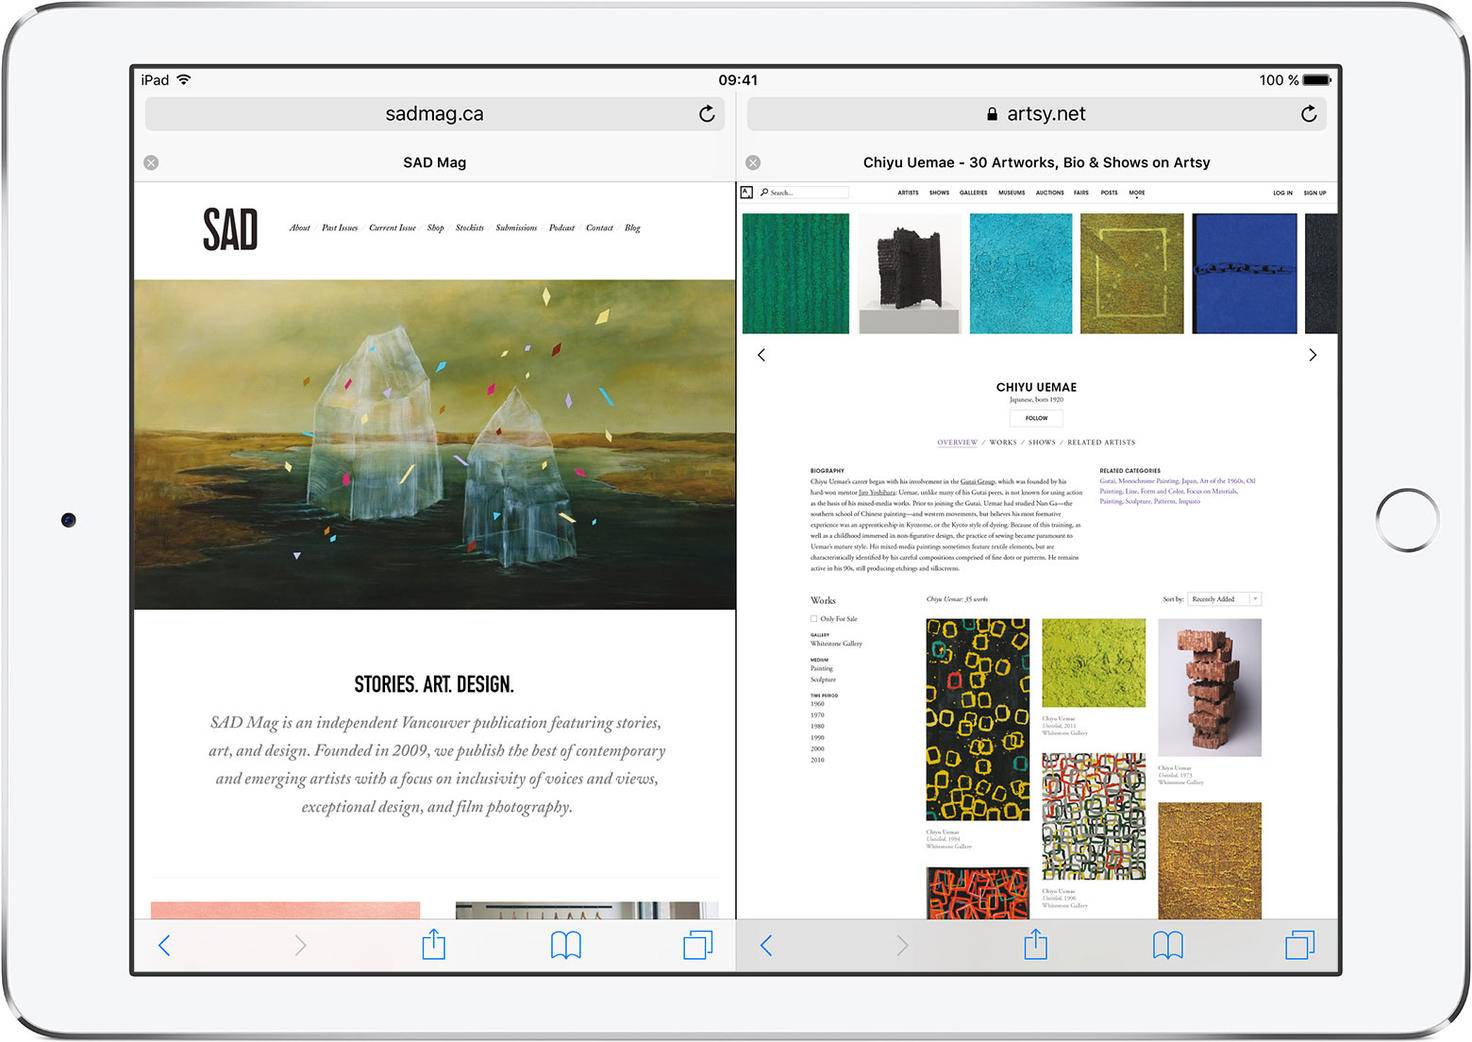 iPad-Safari